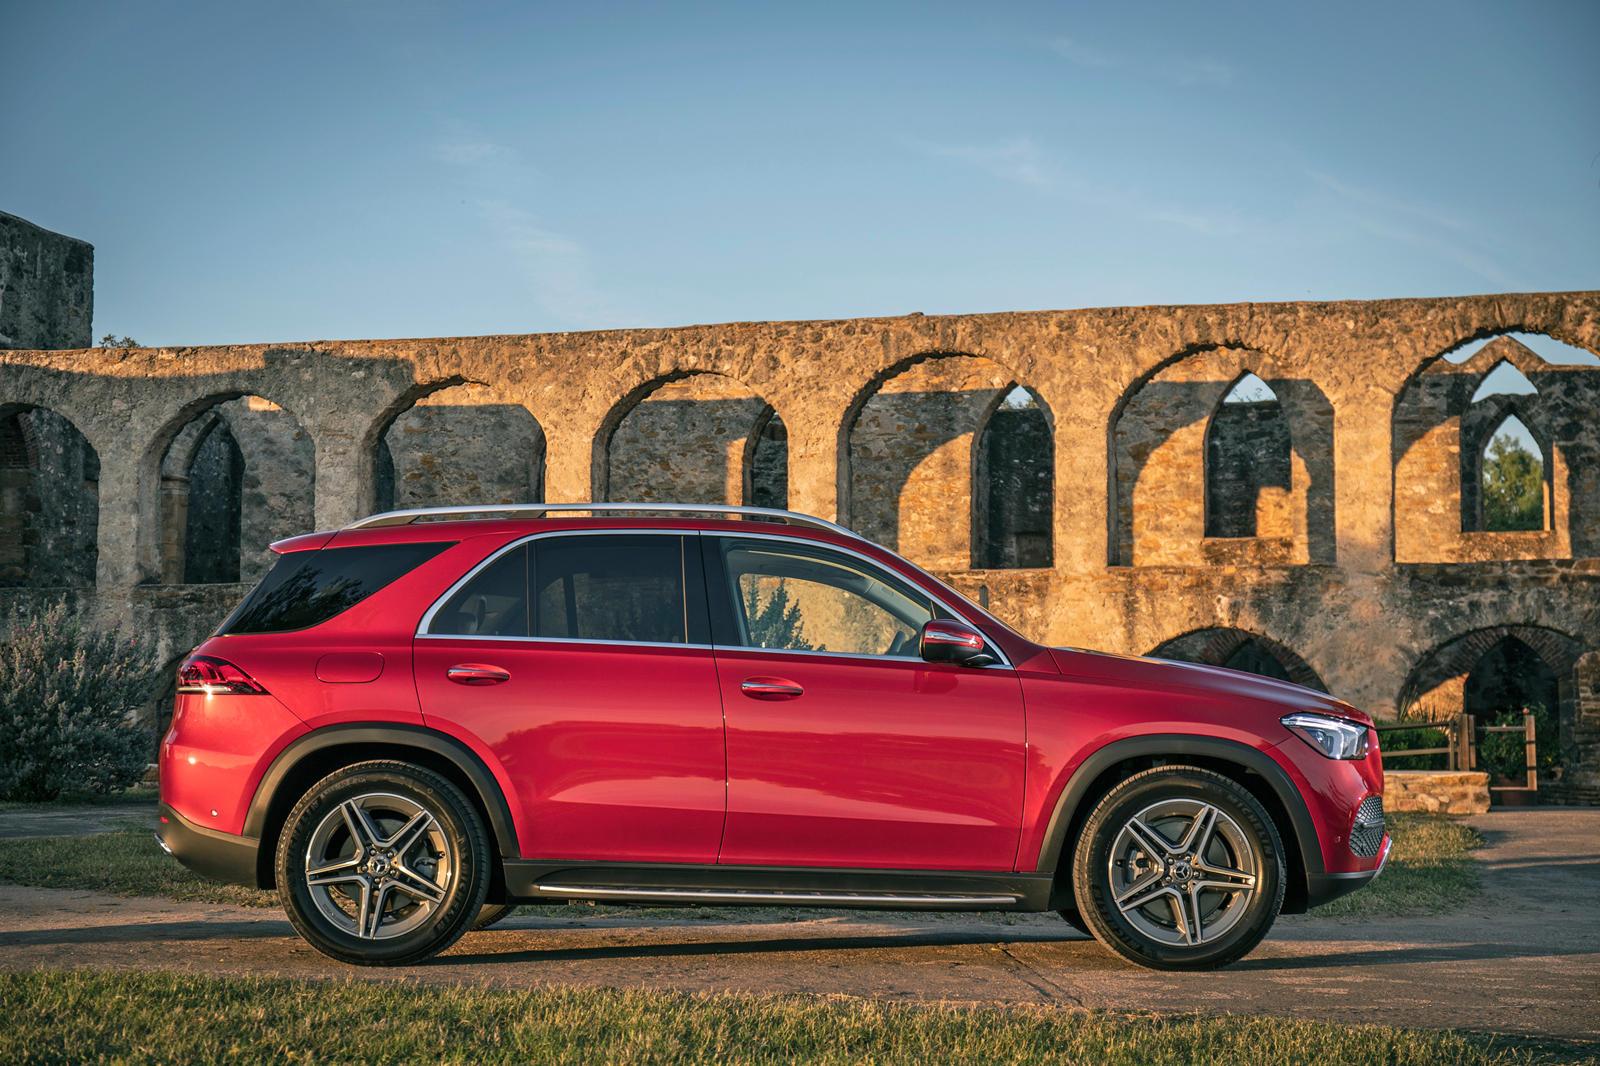 2149 2020 Mercedes-Benz GLE First Drive Review: A Class Apart